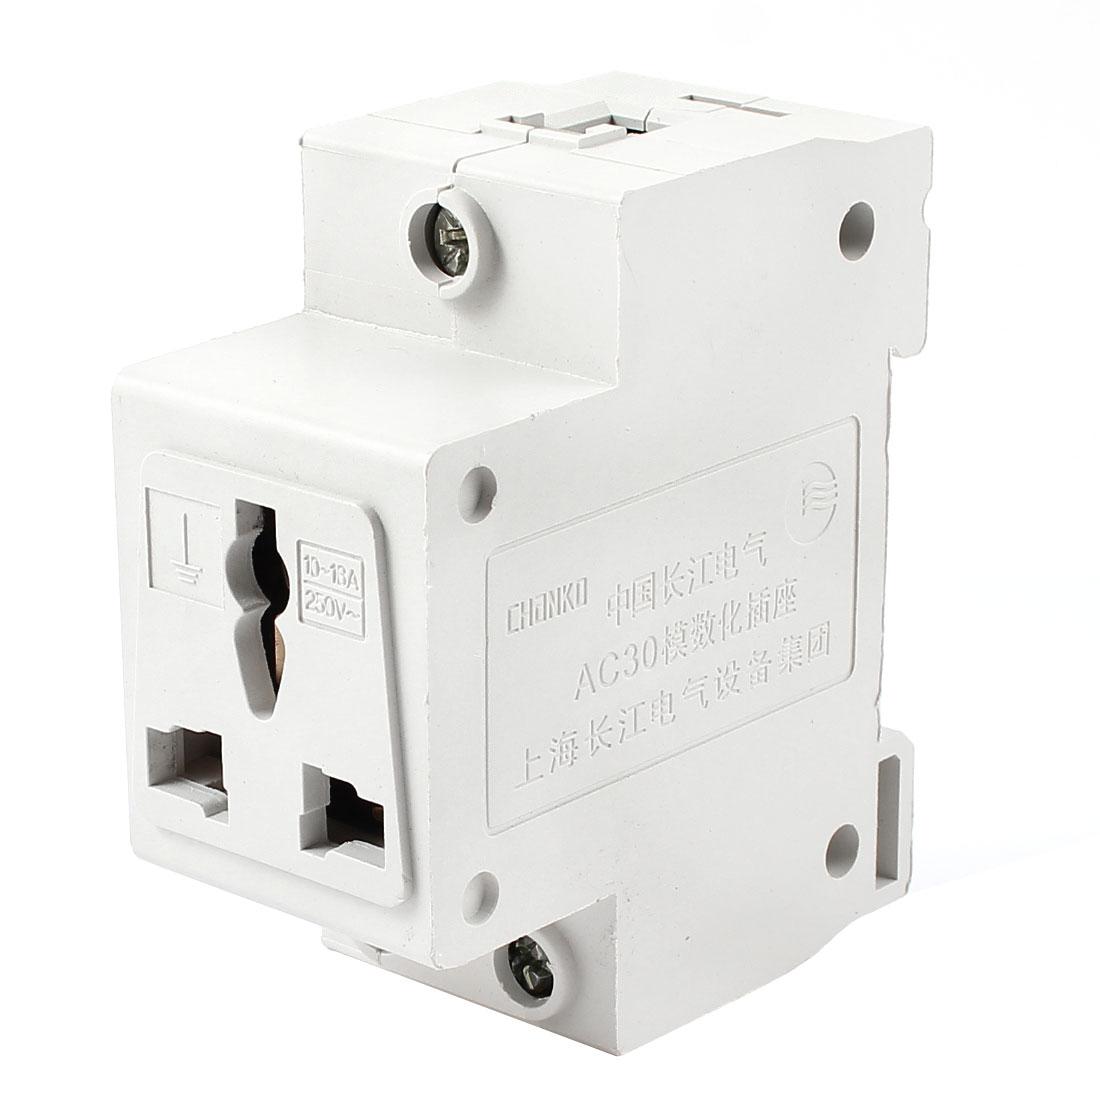 AU EU UK US Plug AC 250V 10-16 Amp 35mm DIN Rail Electrical Digit Modular Socket